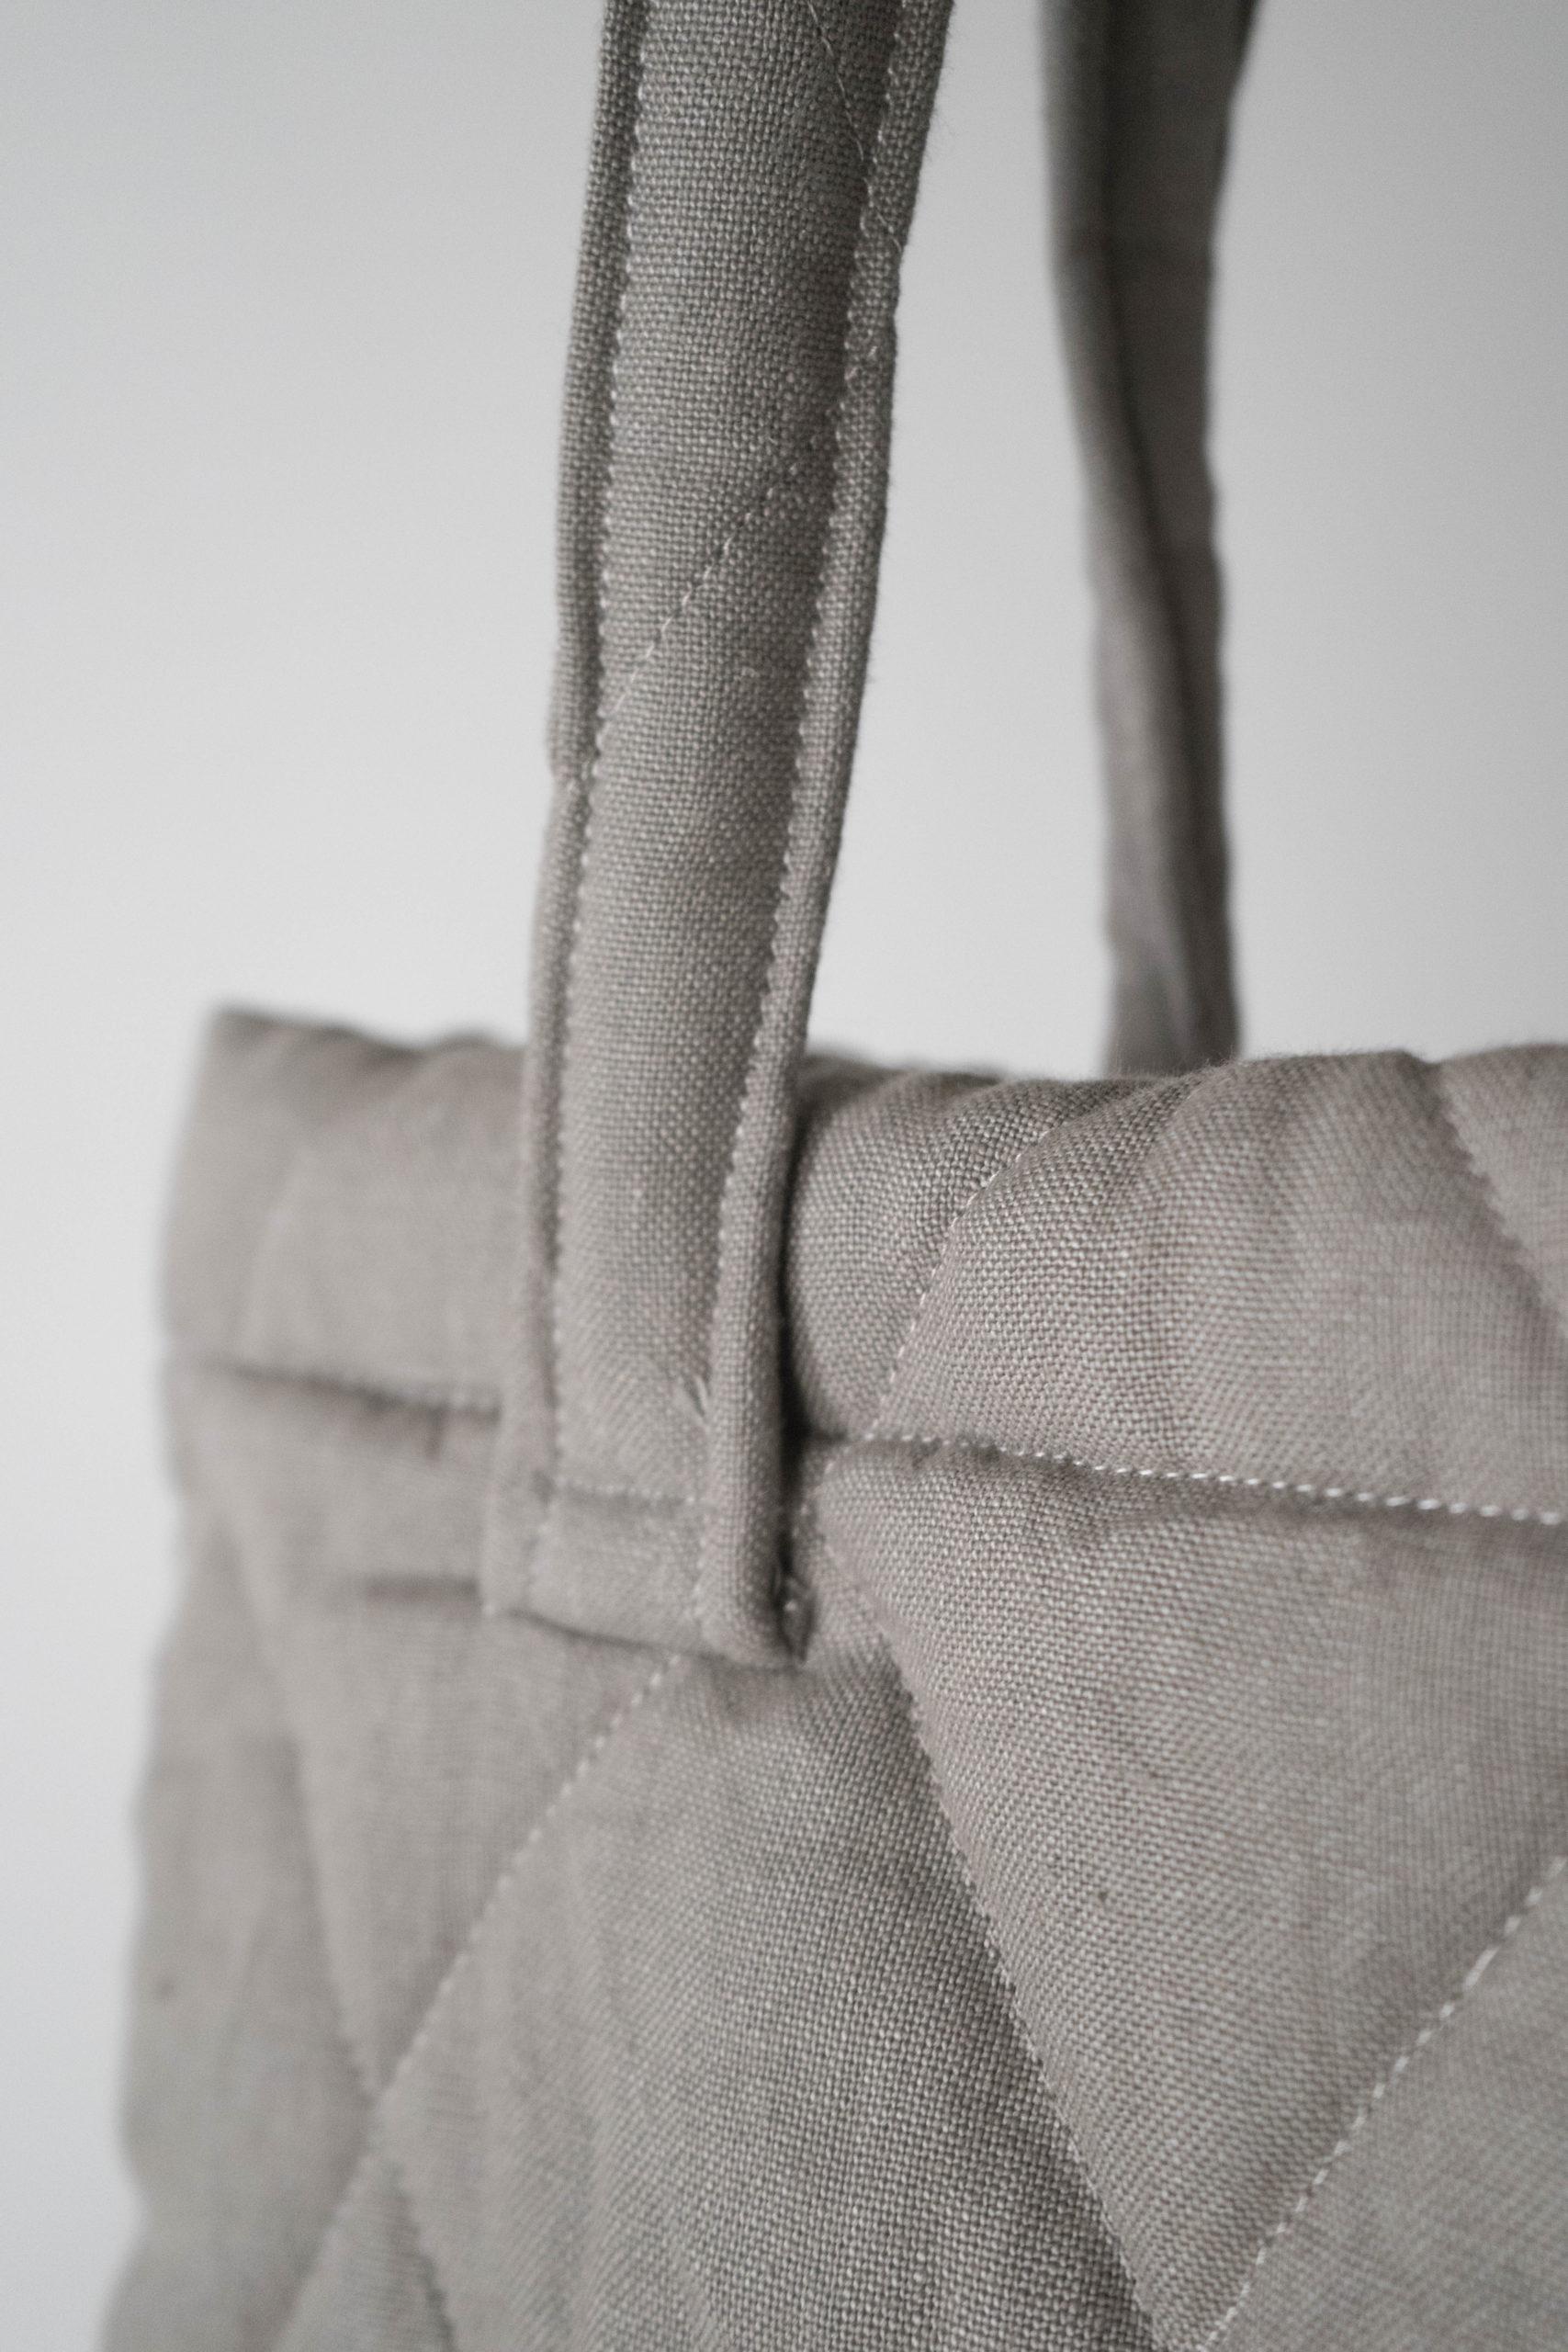 bolsa de tela pepita guata diseño